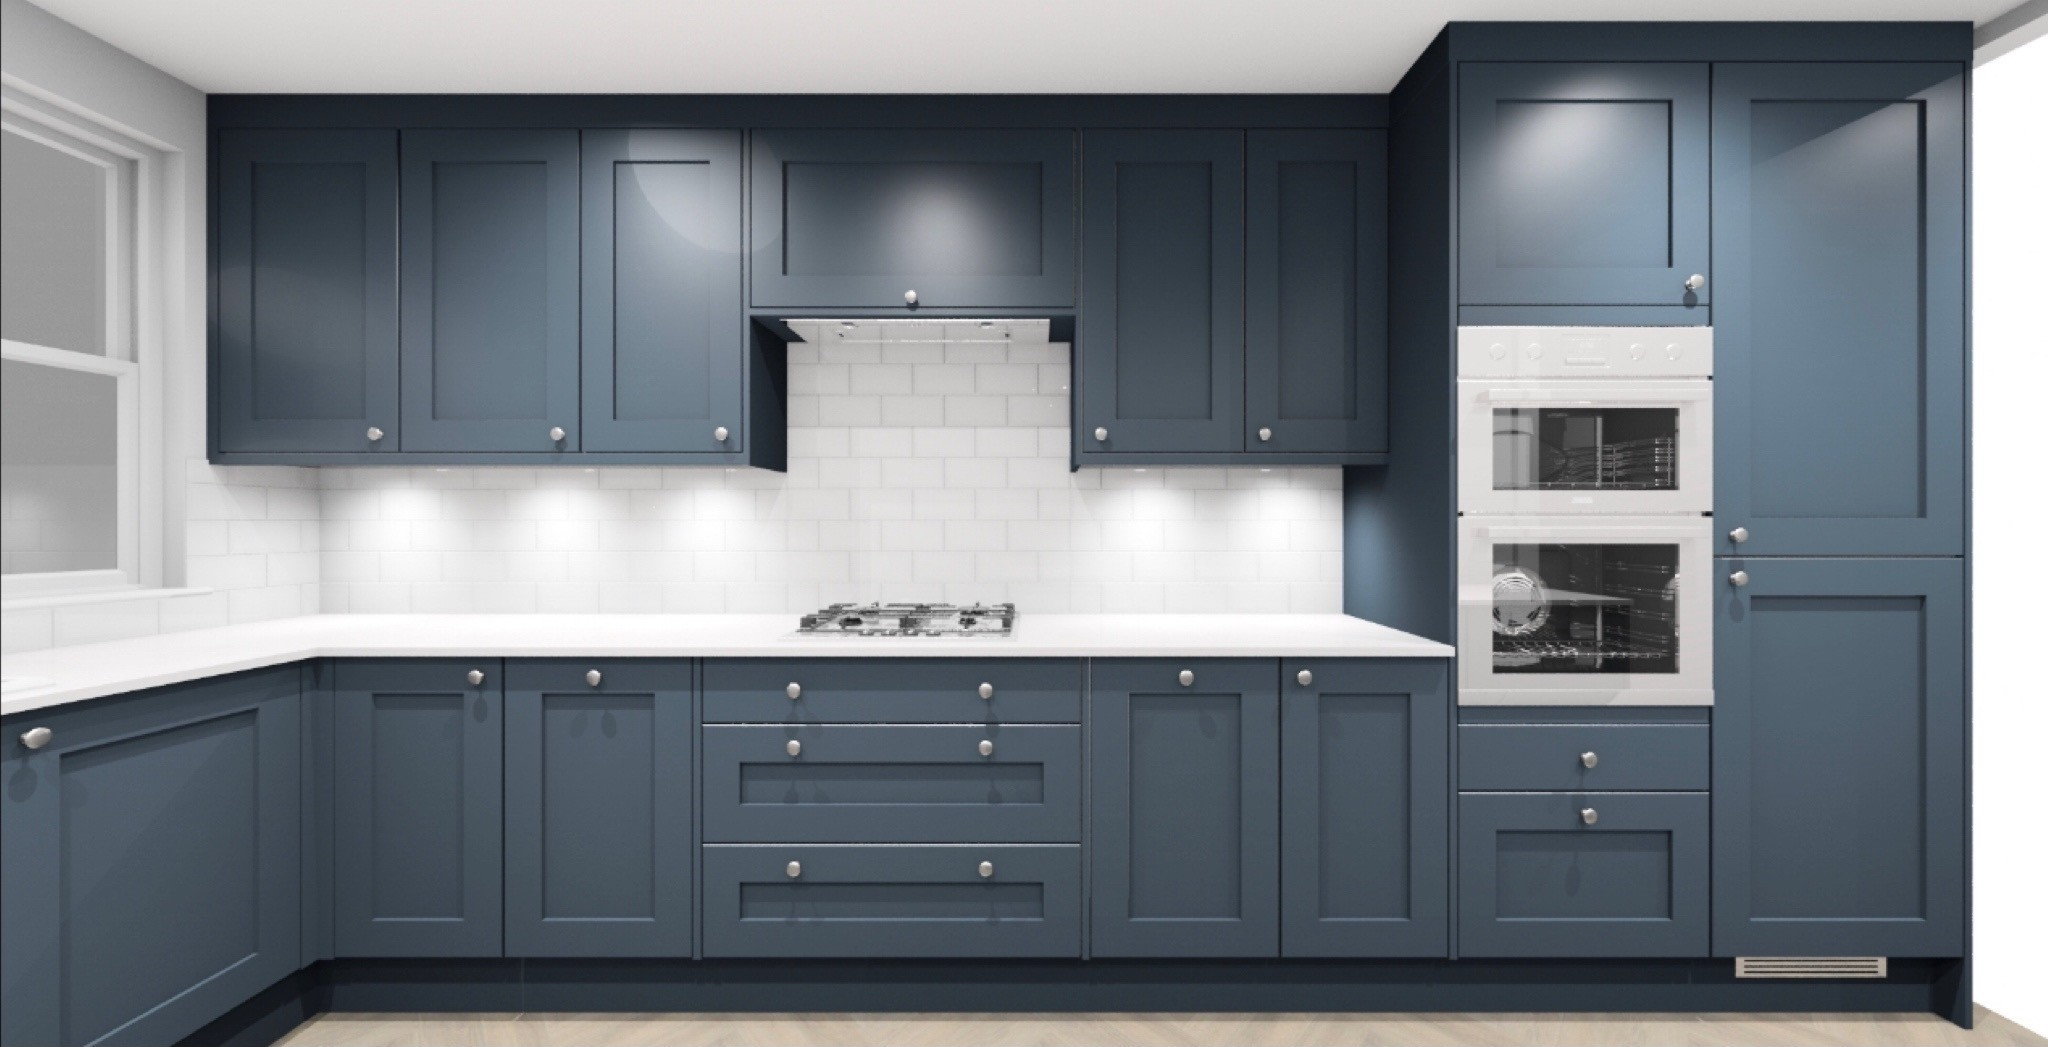 Bespoke Kitchen Installation in Poole